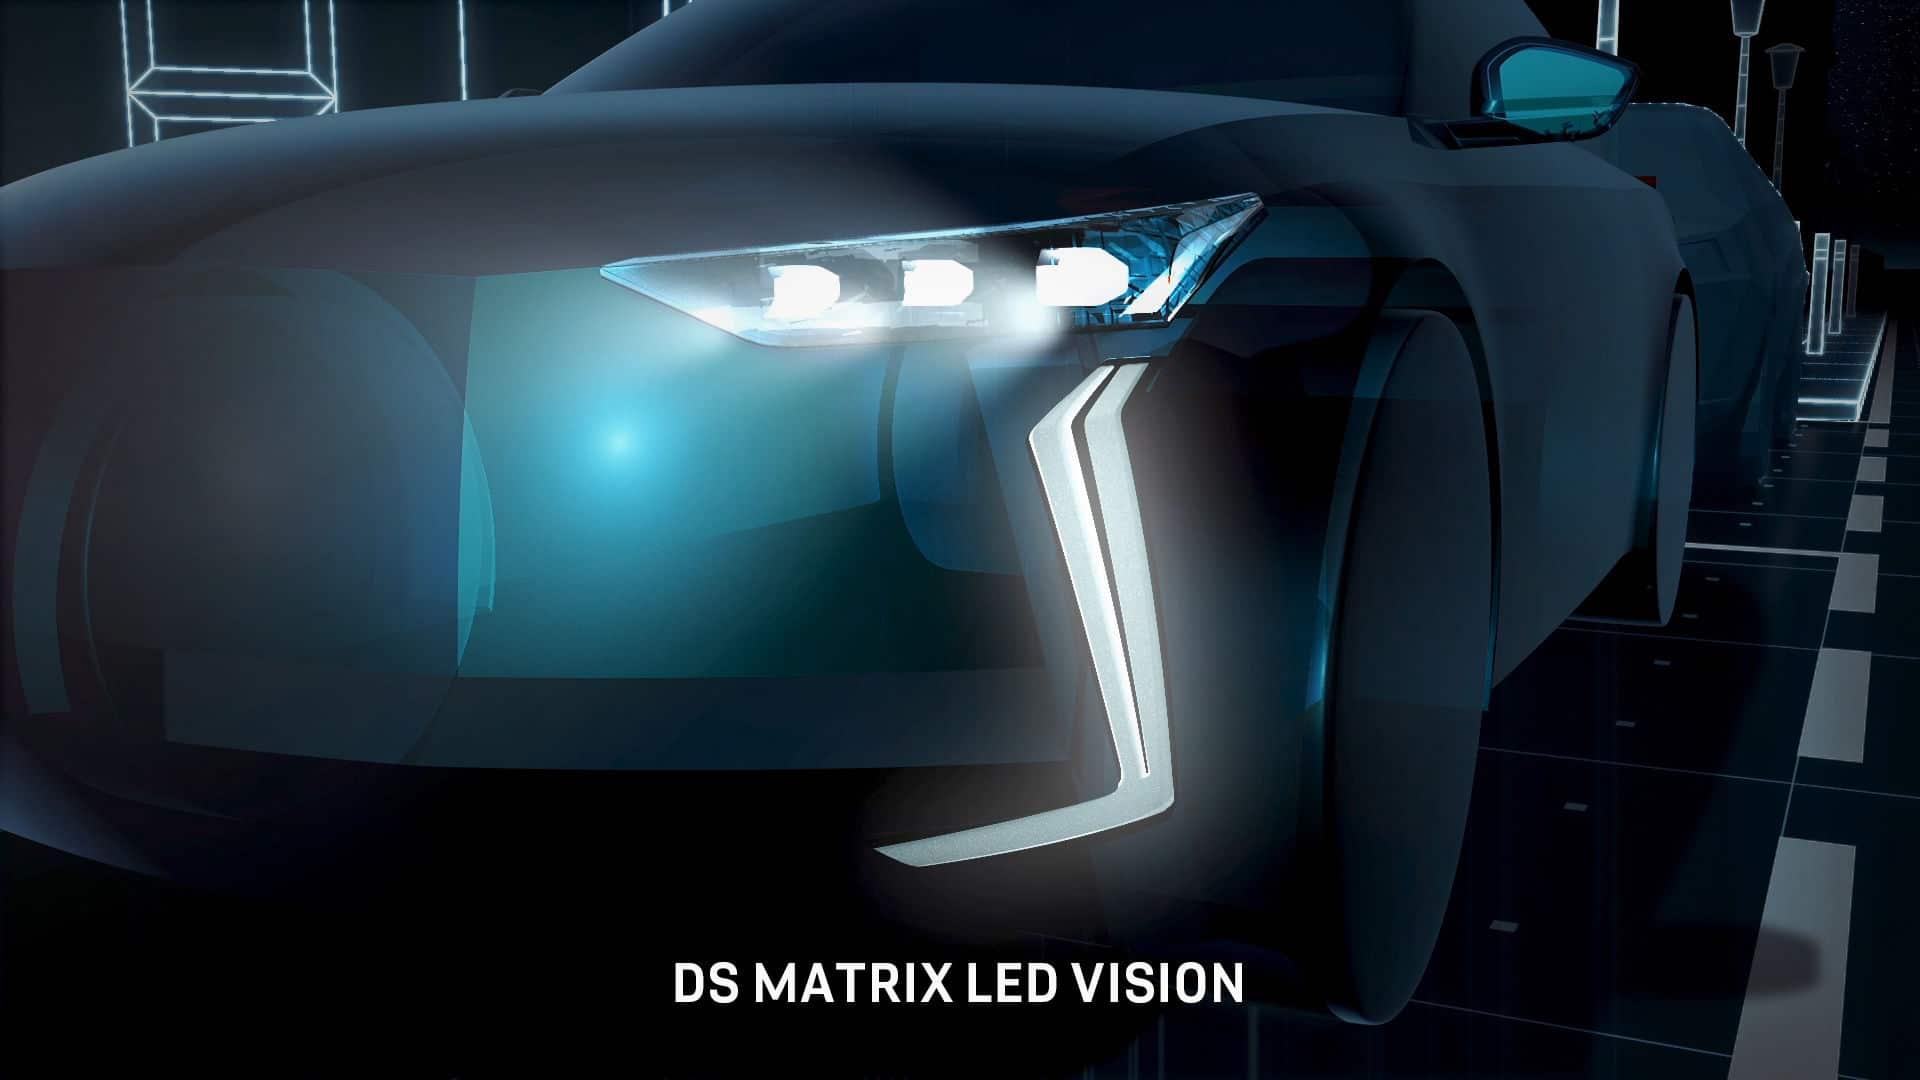 Optiques LED DS 4 2021